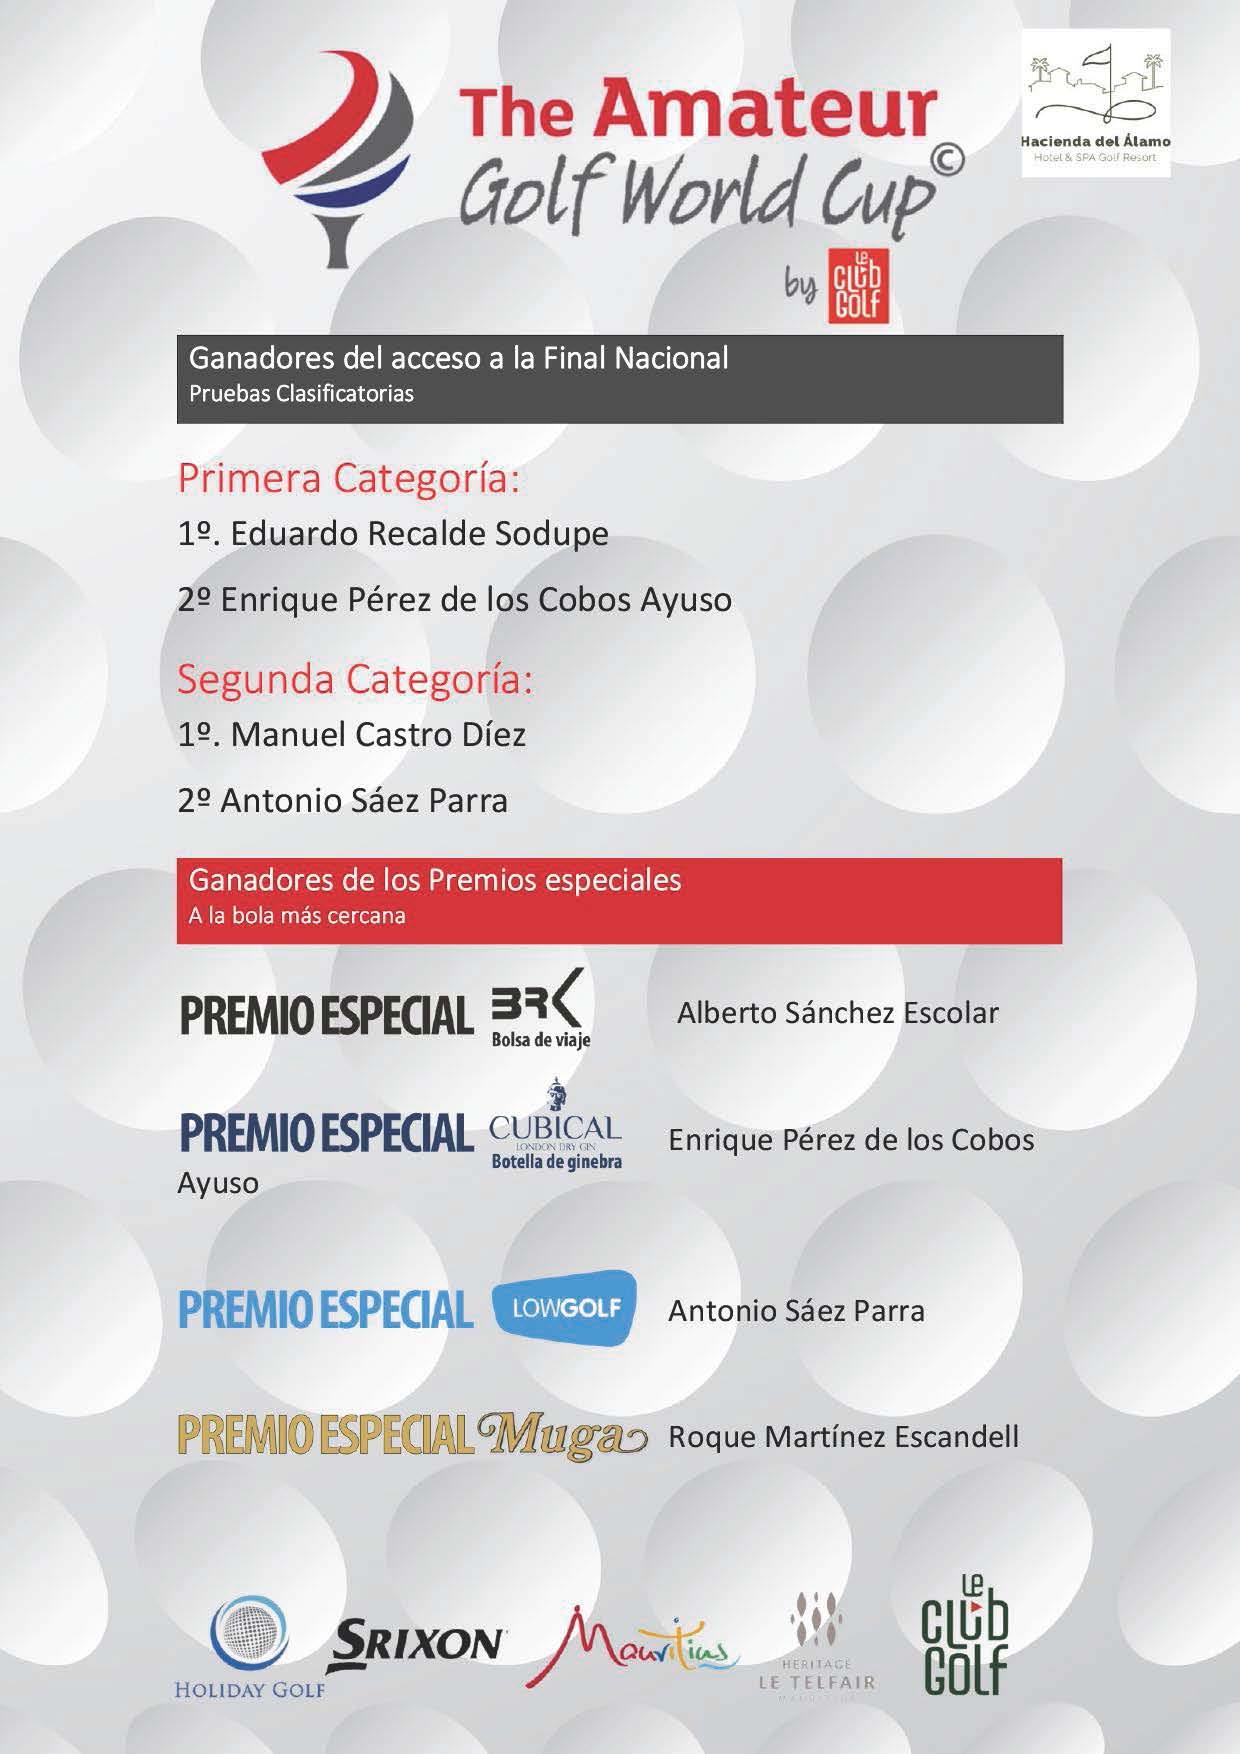 201226 HDA, Listado de ganadores